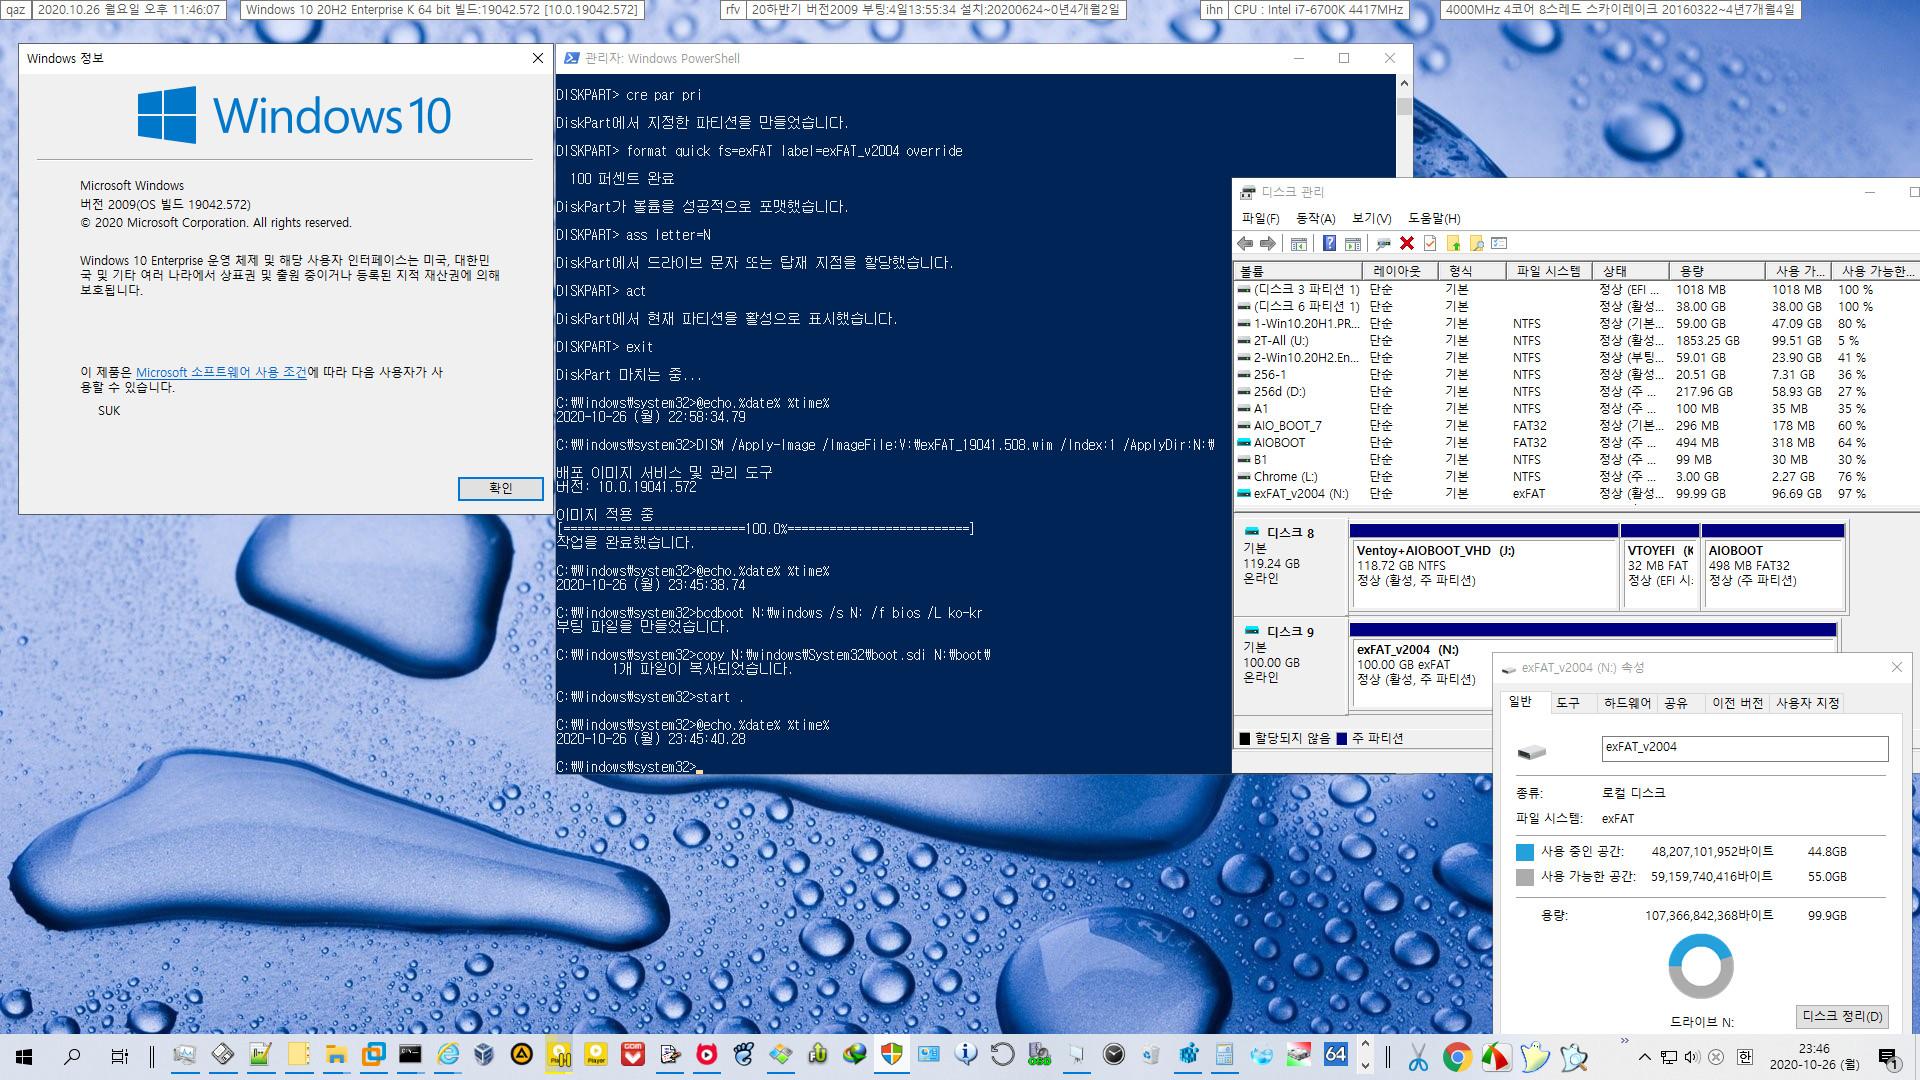 exFAT 포맷으로도 VHD 부팅이 Windows 10 버전 1903부터 된다고 하여 테스트 - 생고생만 하다가 컴퓨터 먹통 2번이나 되고 그만뒀습니다 2020-10-26_234607.jpg